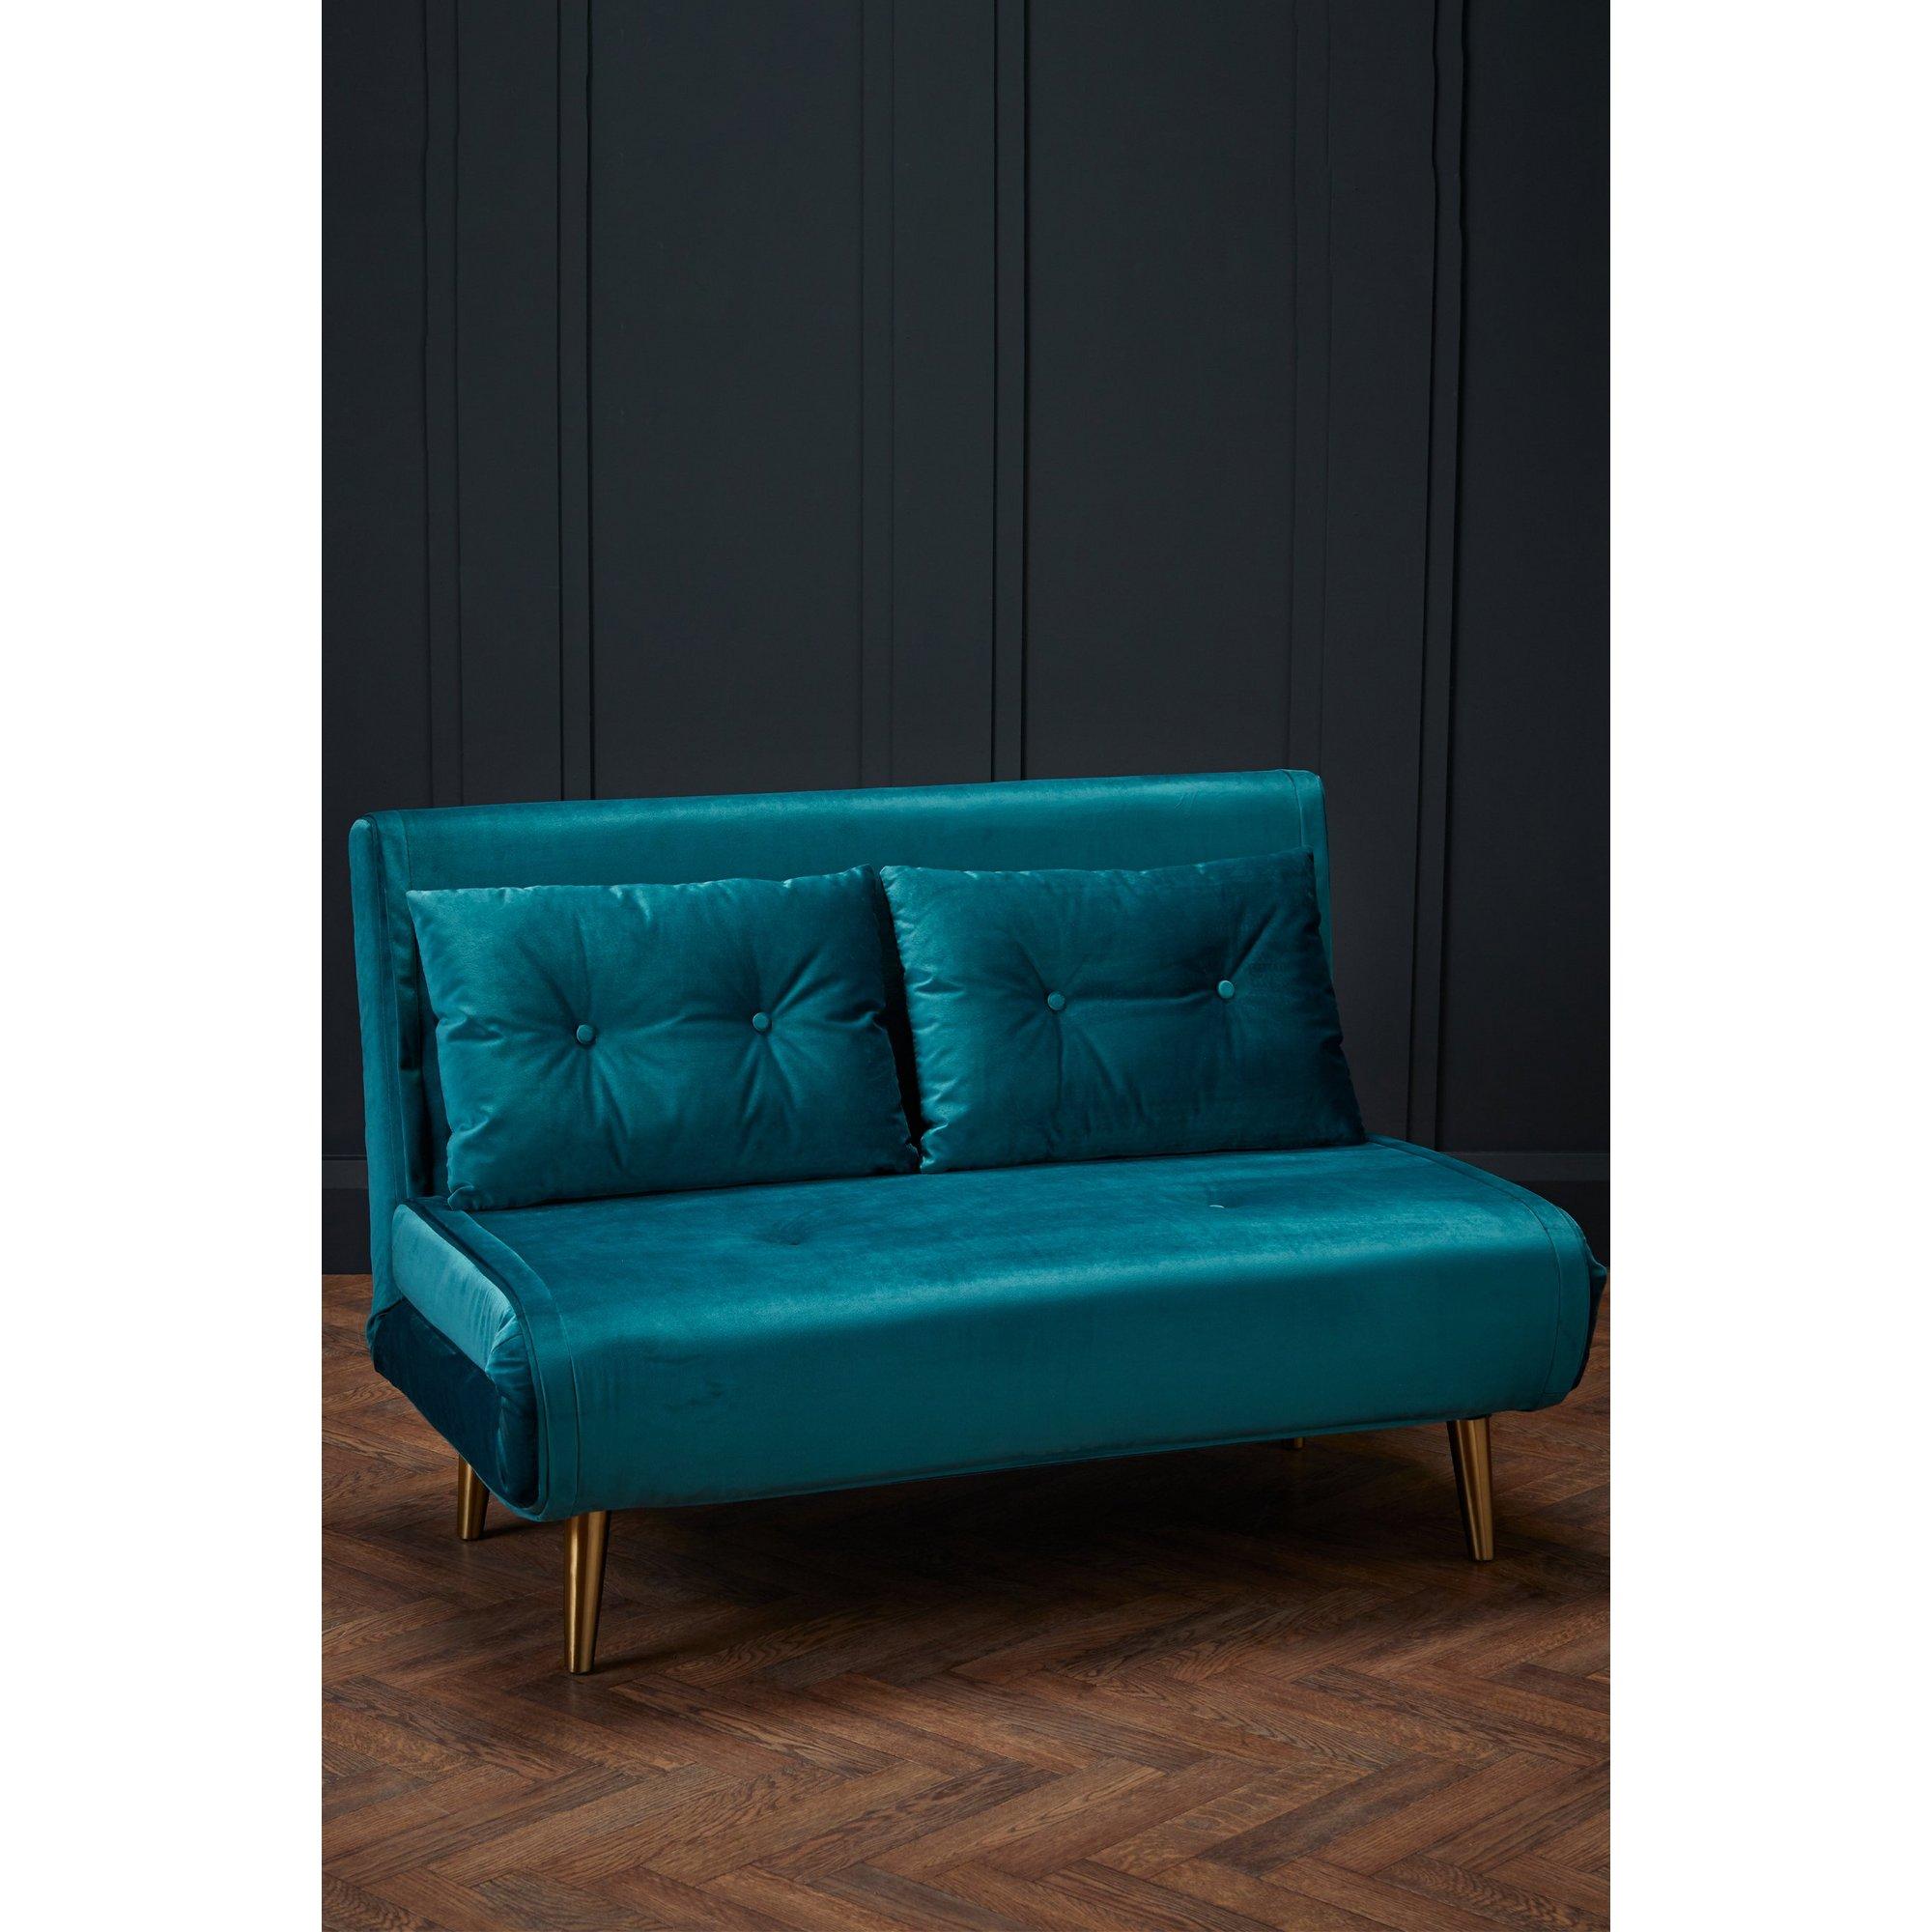 Image of Madison Sofa Bed